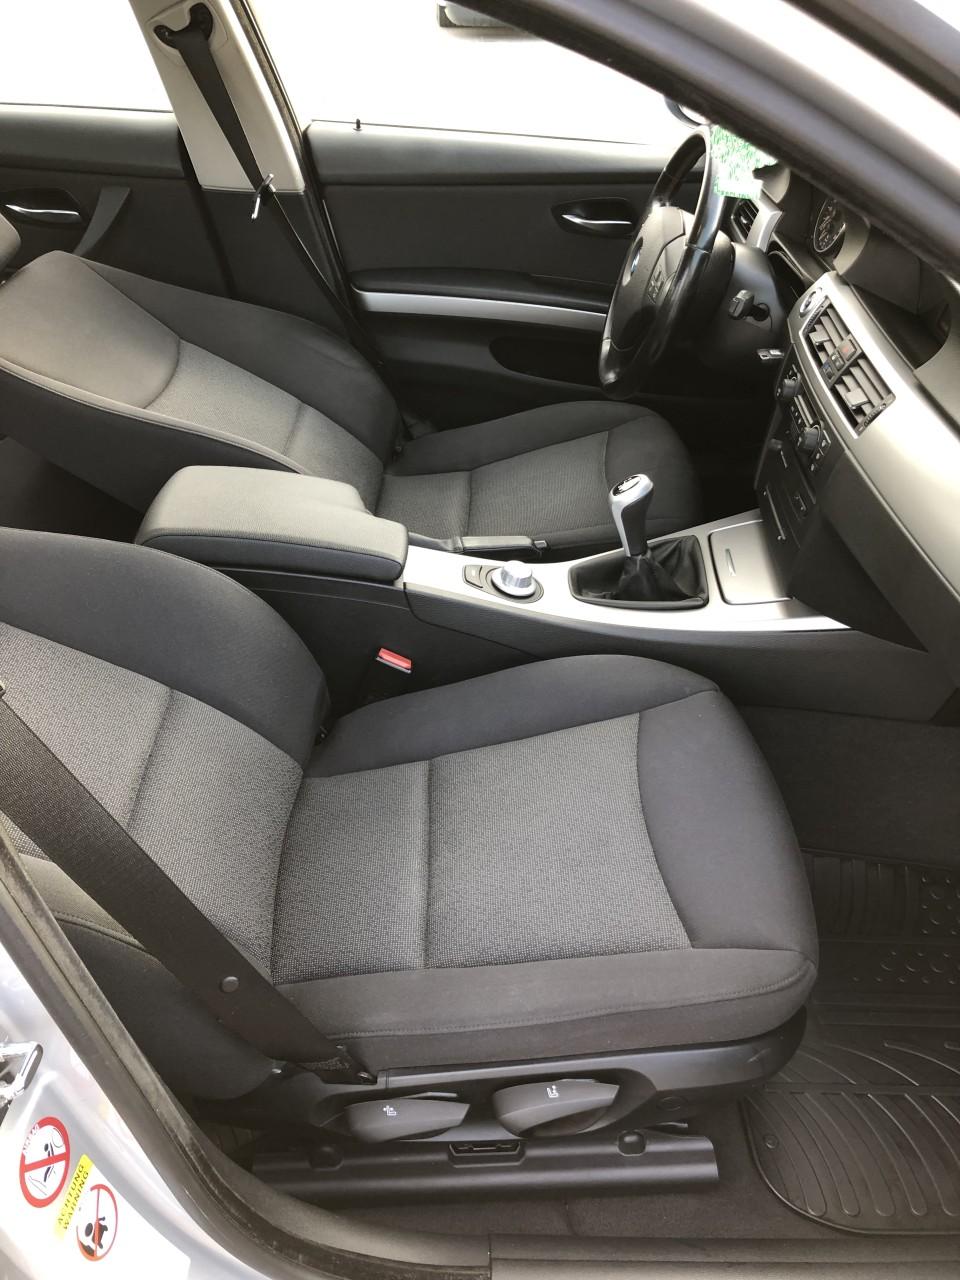 BMW 320 BMW 320d 163Cp / Navigatie / Pilot Automat /Scaune incalzite/ Senzori parcare / RECENT ADUSA DIN GERMANIA!!! 2007